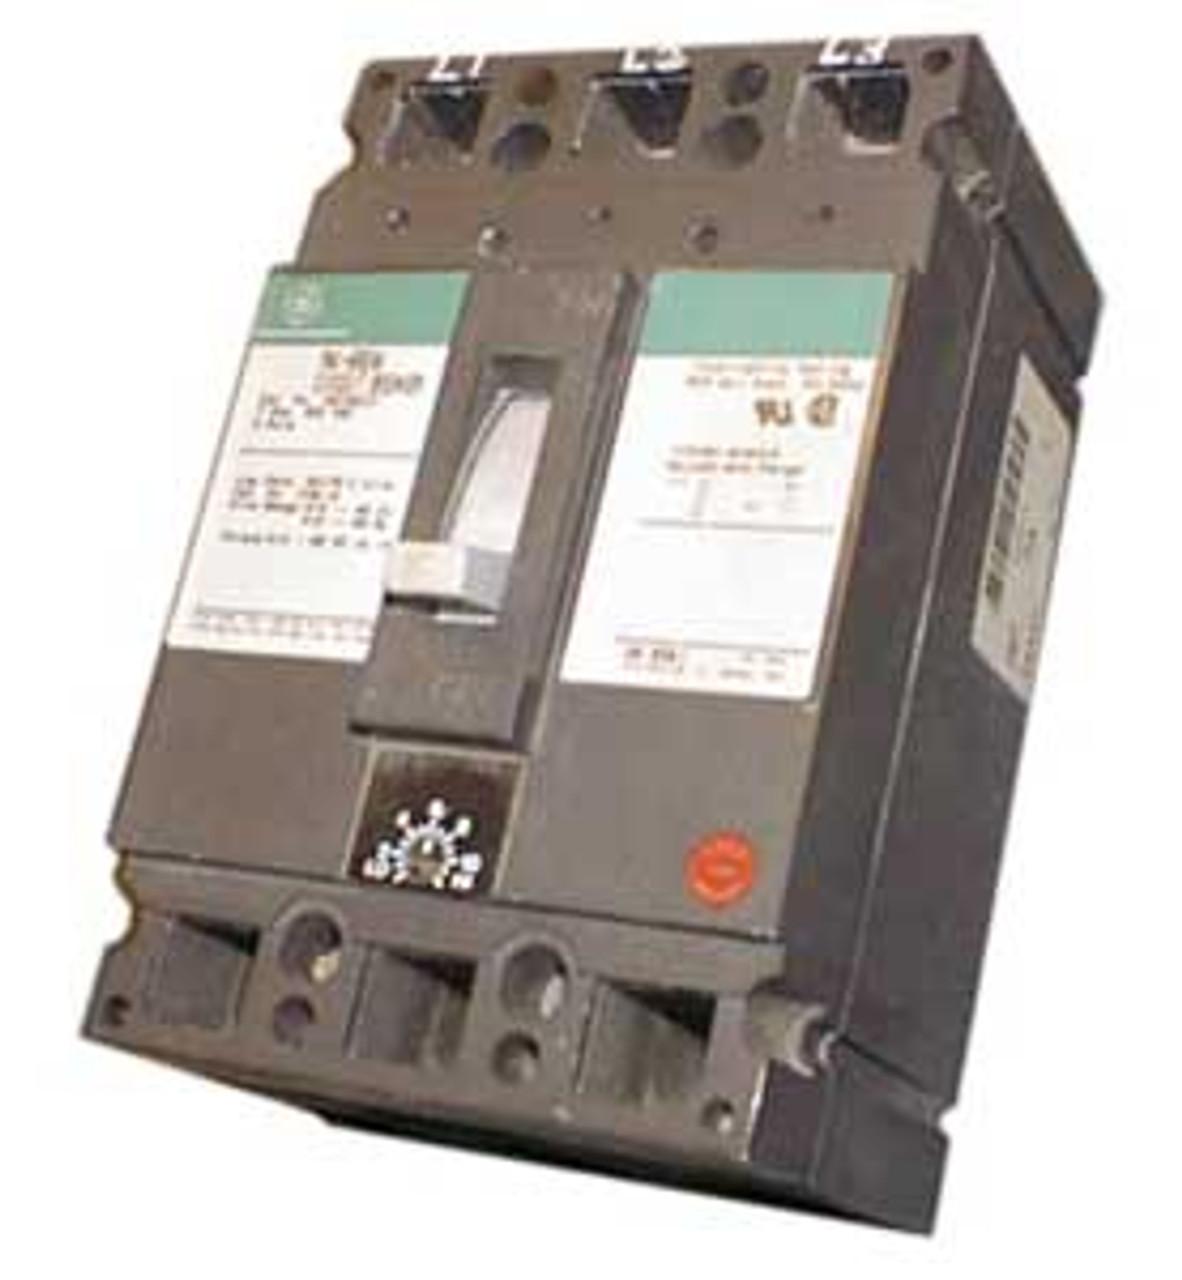 General Electric TEC36100 3 Pole 100 Amp 600VAC Circuit Breaker - Used